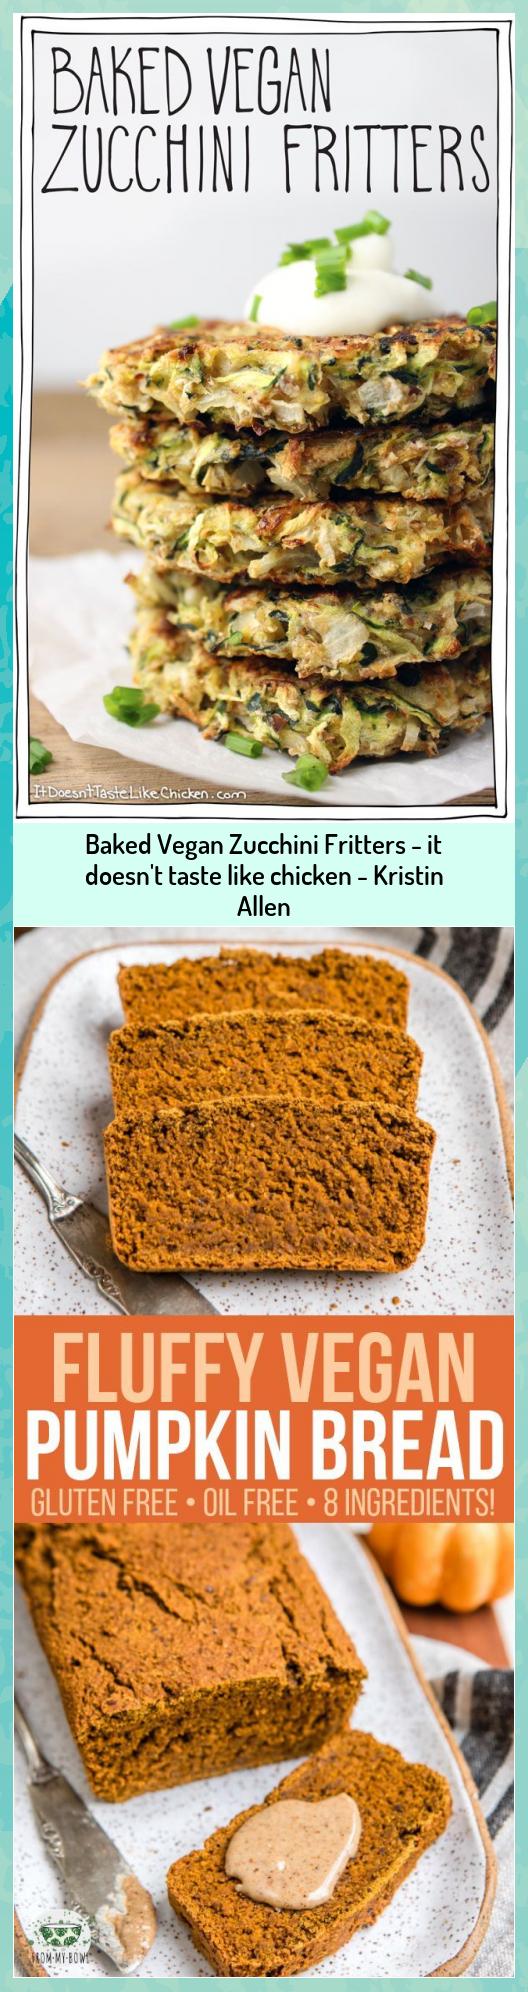 Baked Vegan Zucchini Fritters - it doesn't taste like chicken - Kristin Allen #Allen #Baked #Chicken #doesnt #Fritters #Kristin #Taste #Vegan #Zucchini